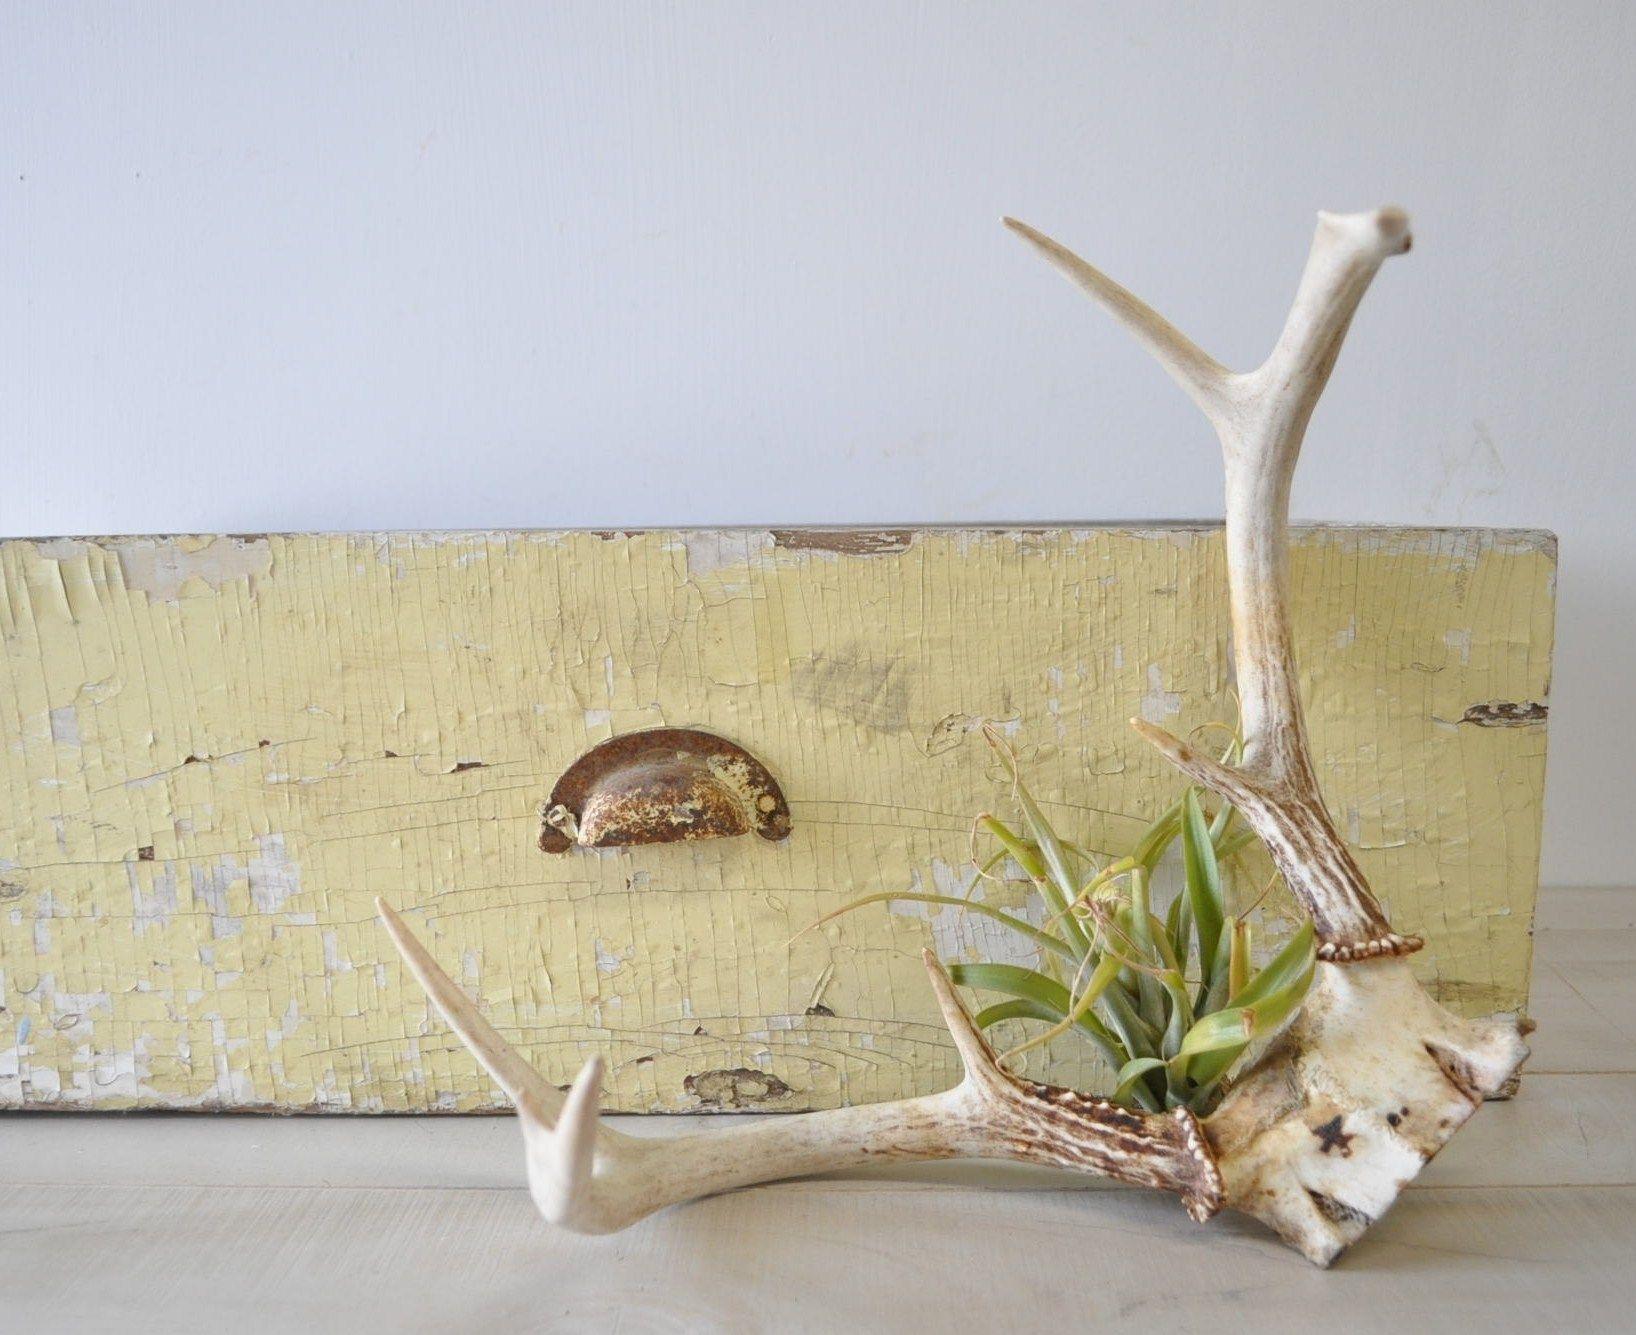 love using deer antlers in home decor. see more at MyraMelinda.etsy ...